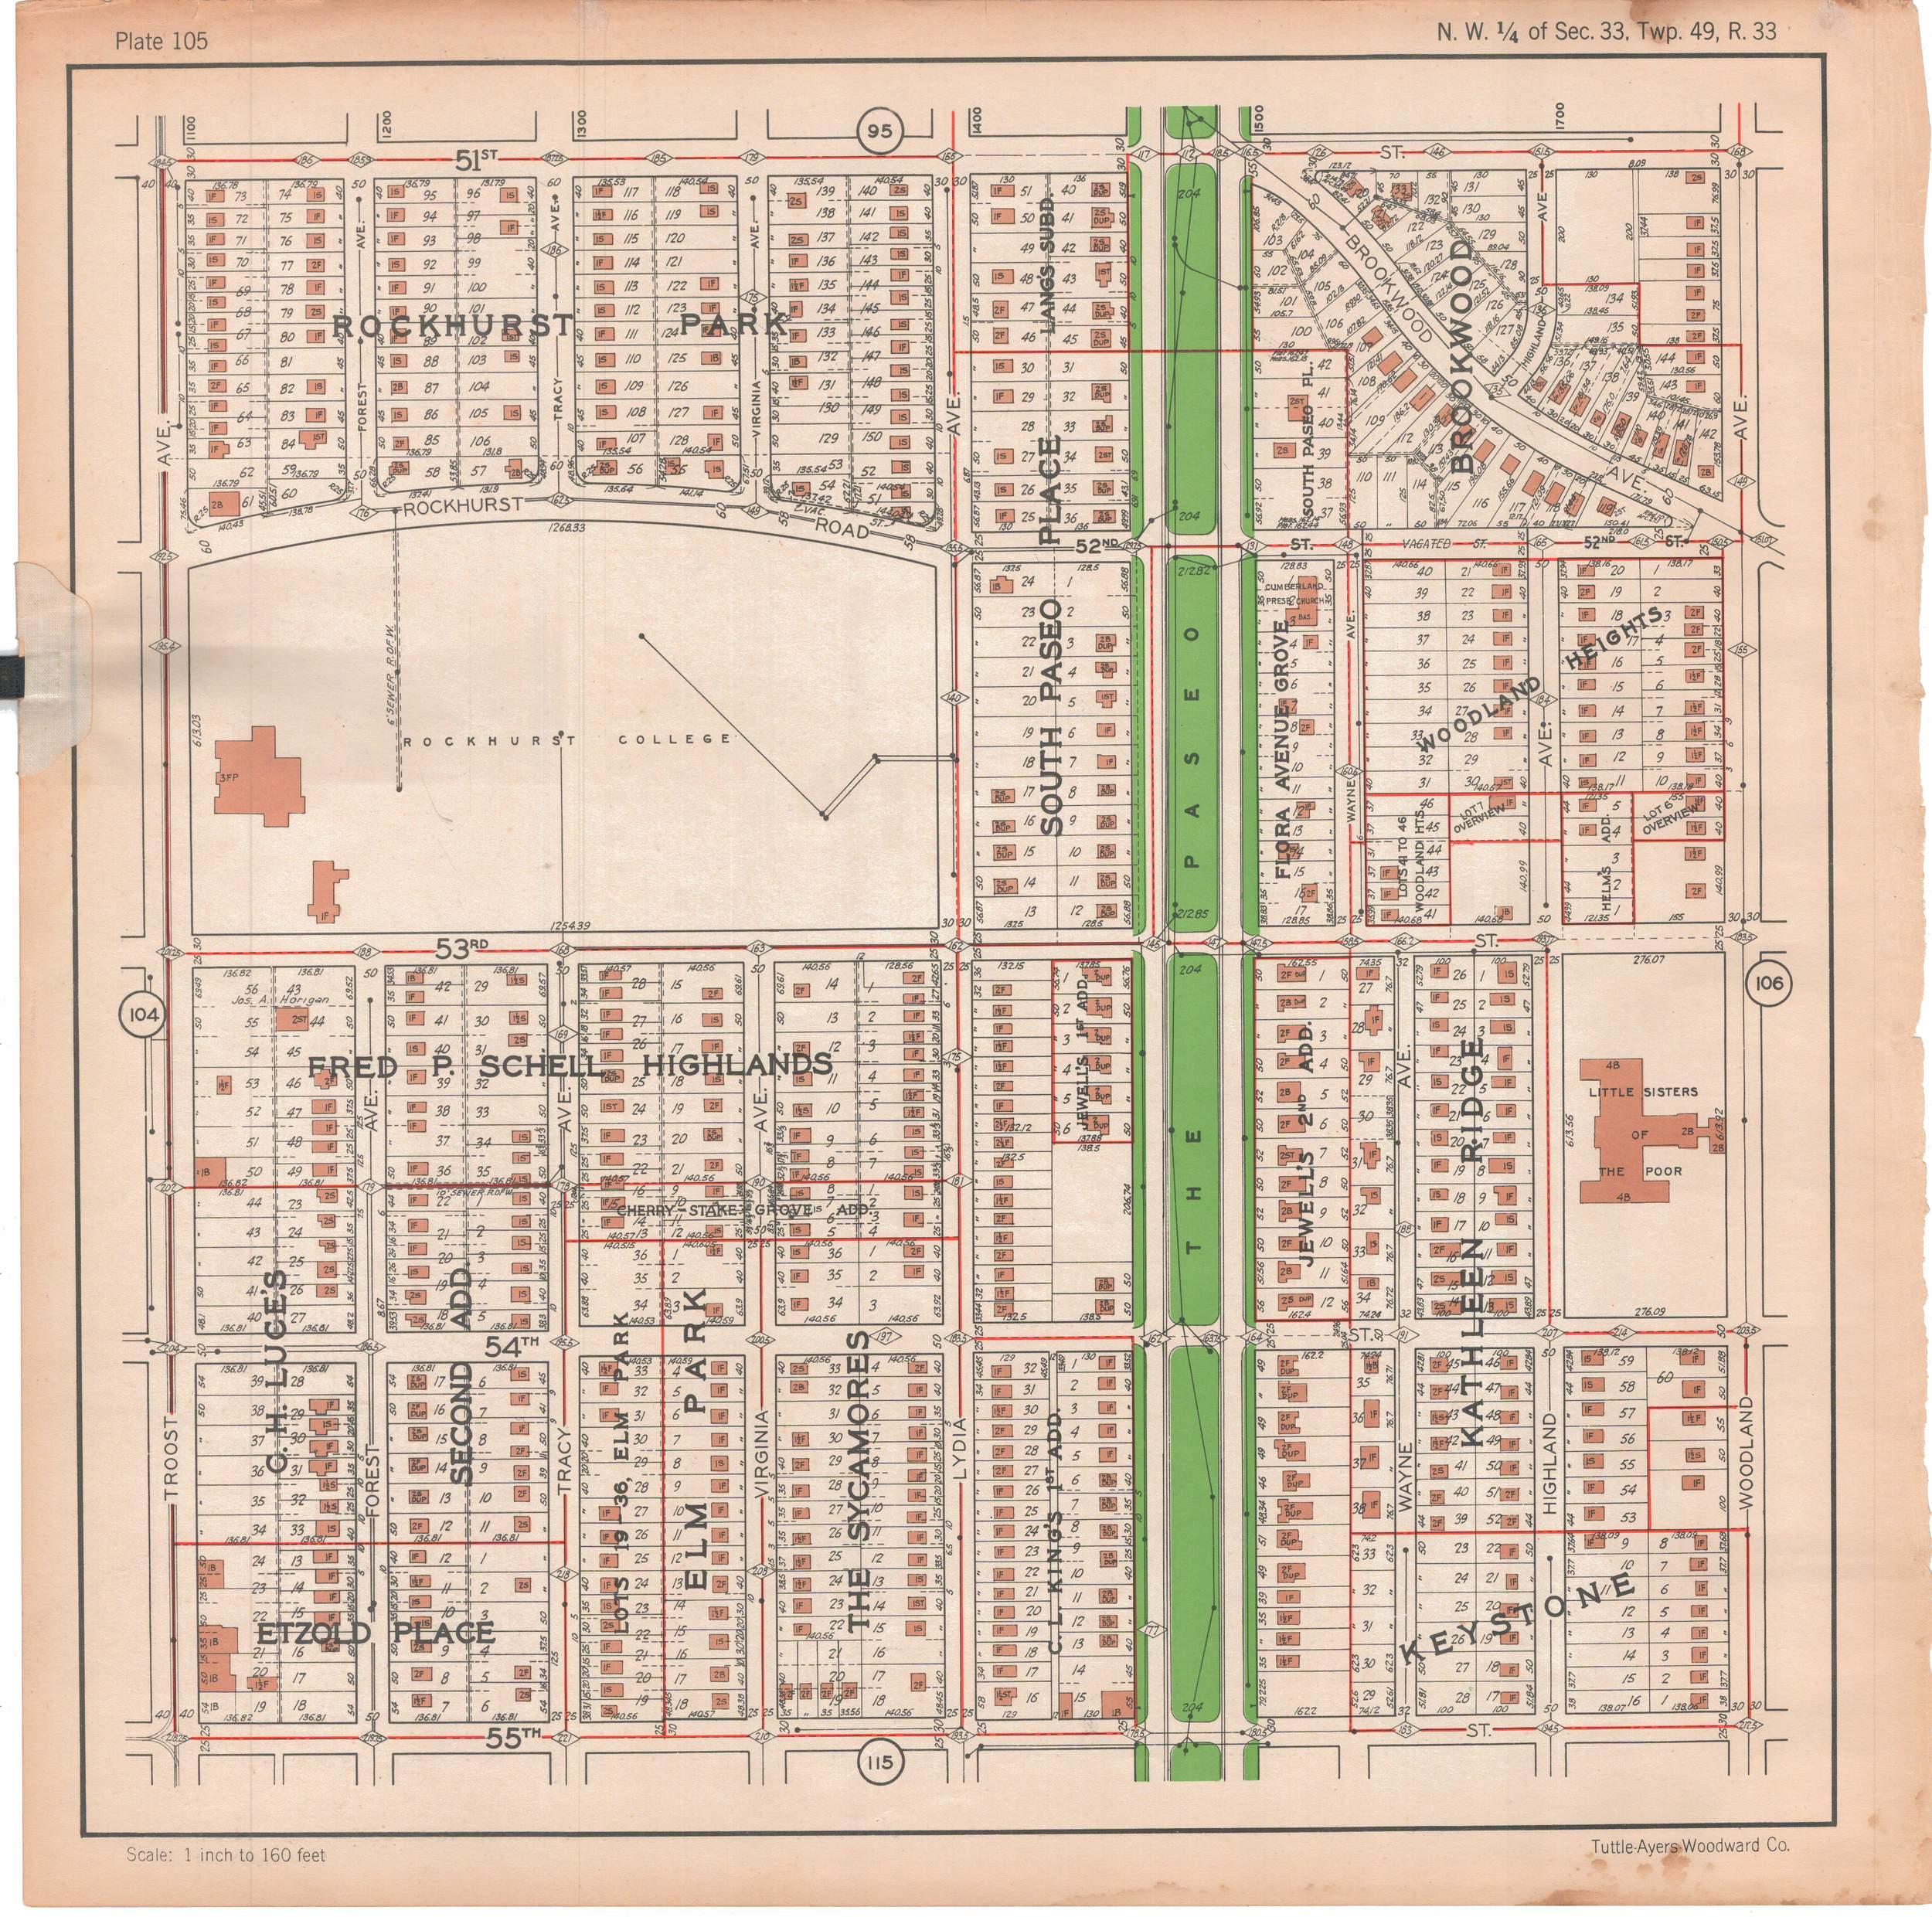 1925 TUTTLE_AYERS_Plate 105.JPG